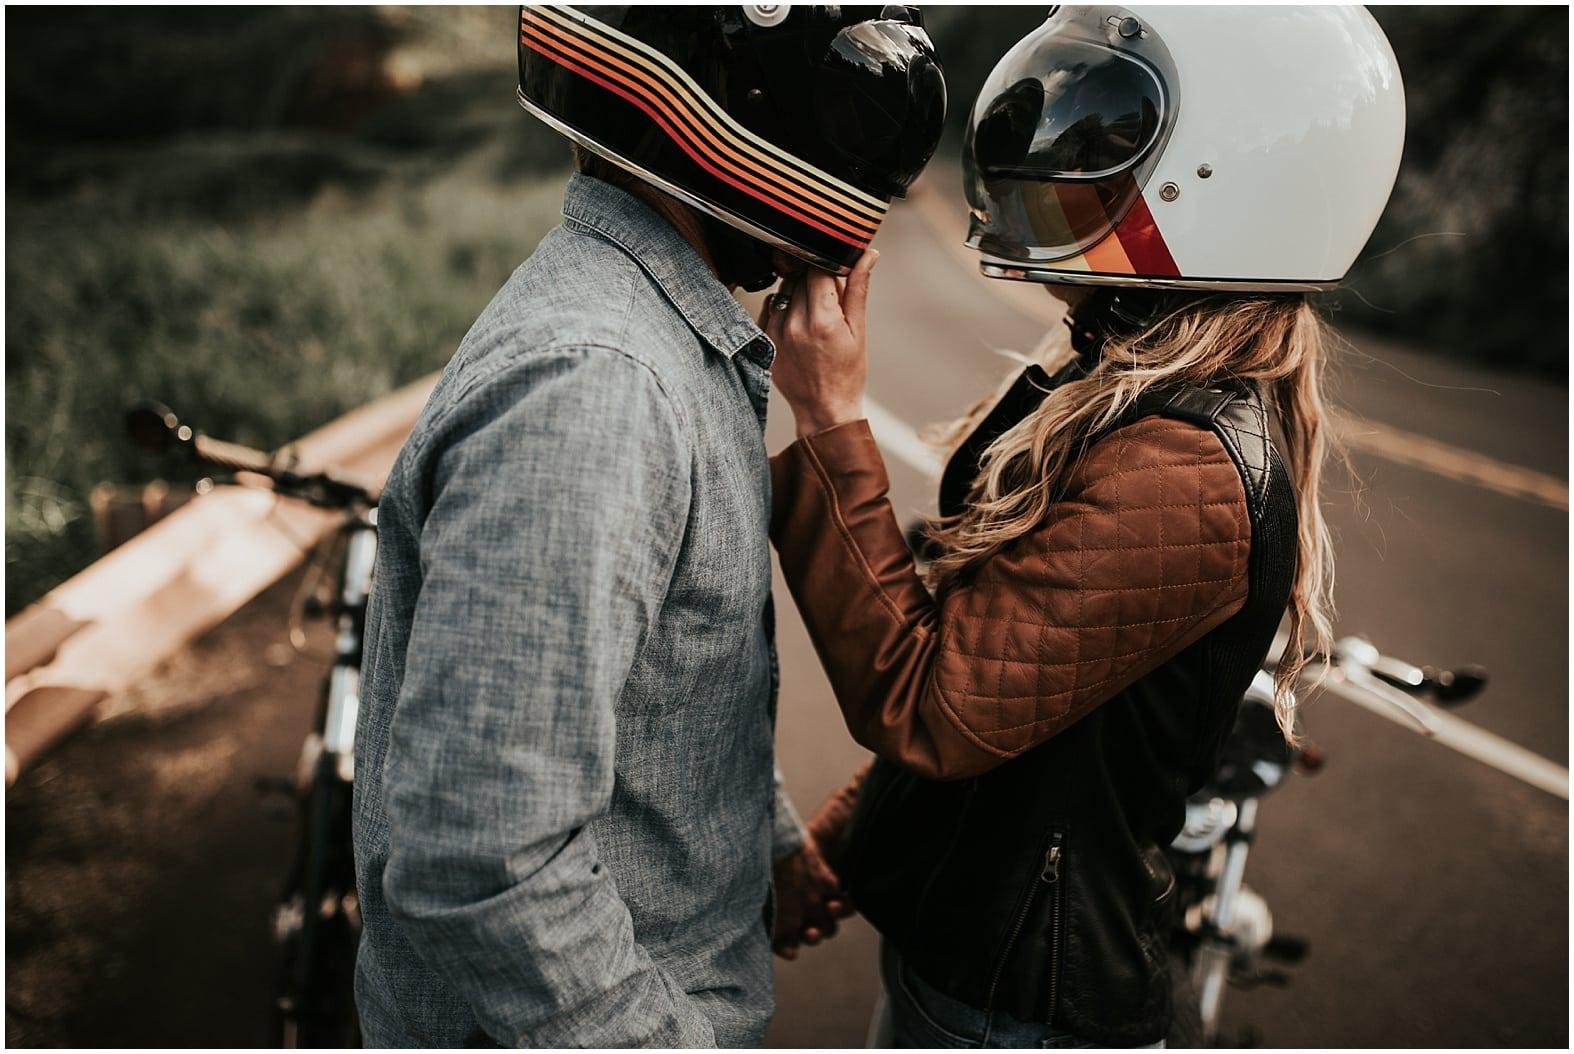 Motorcycle maui21